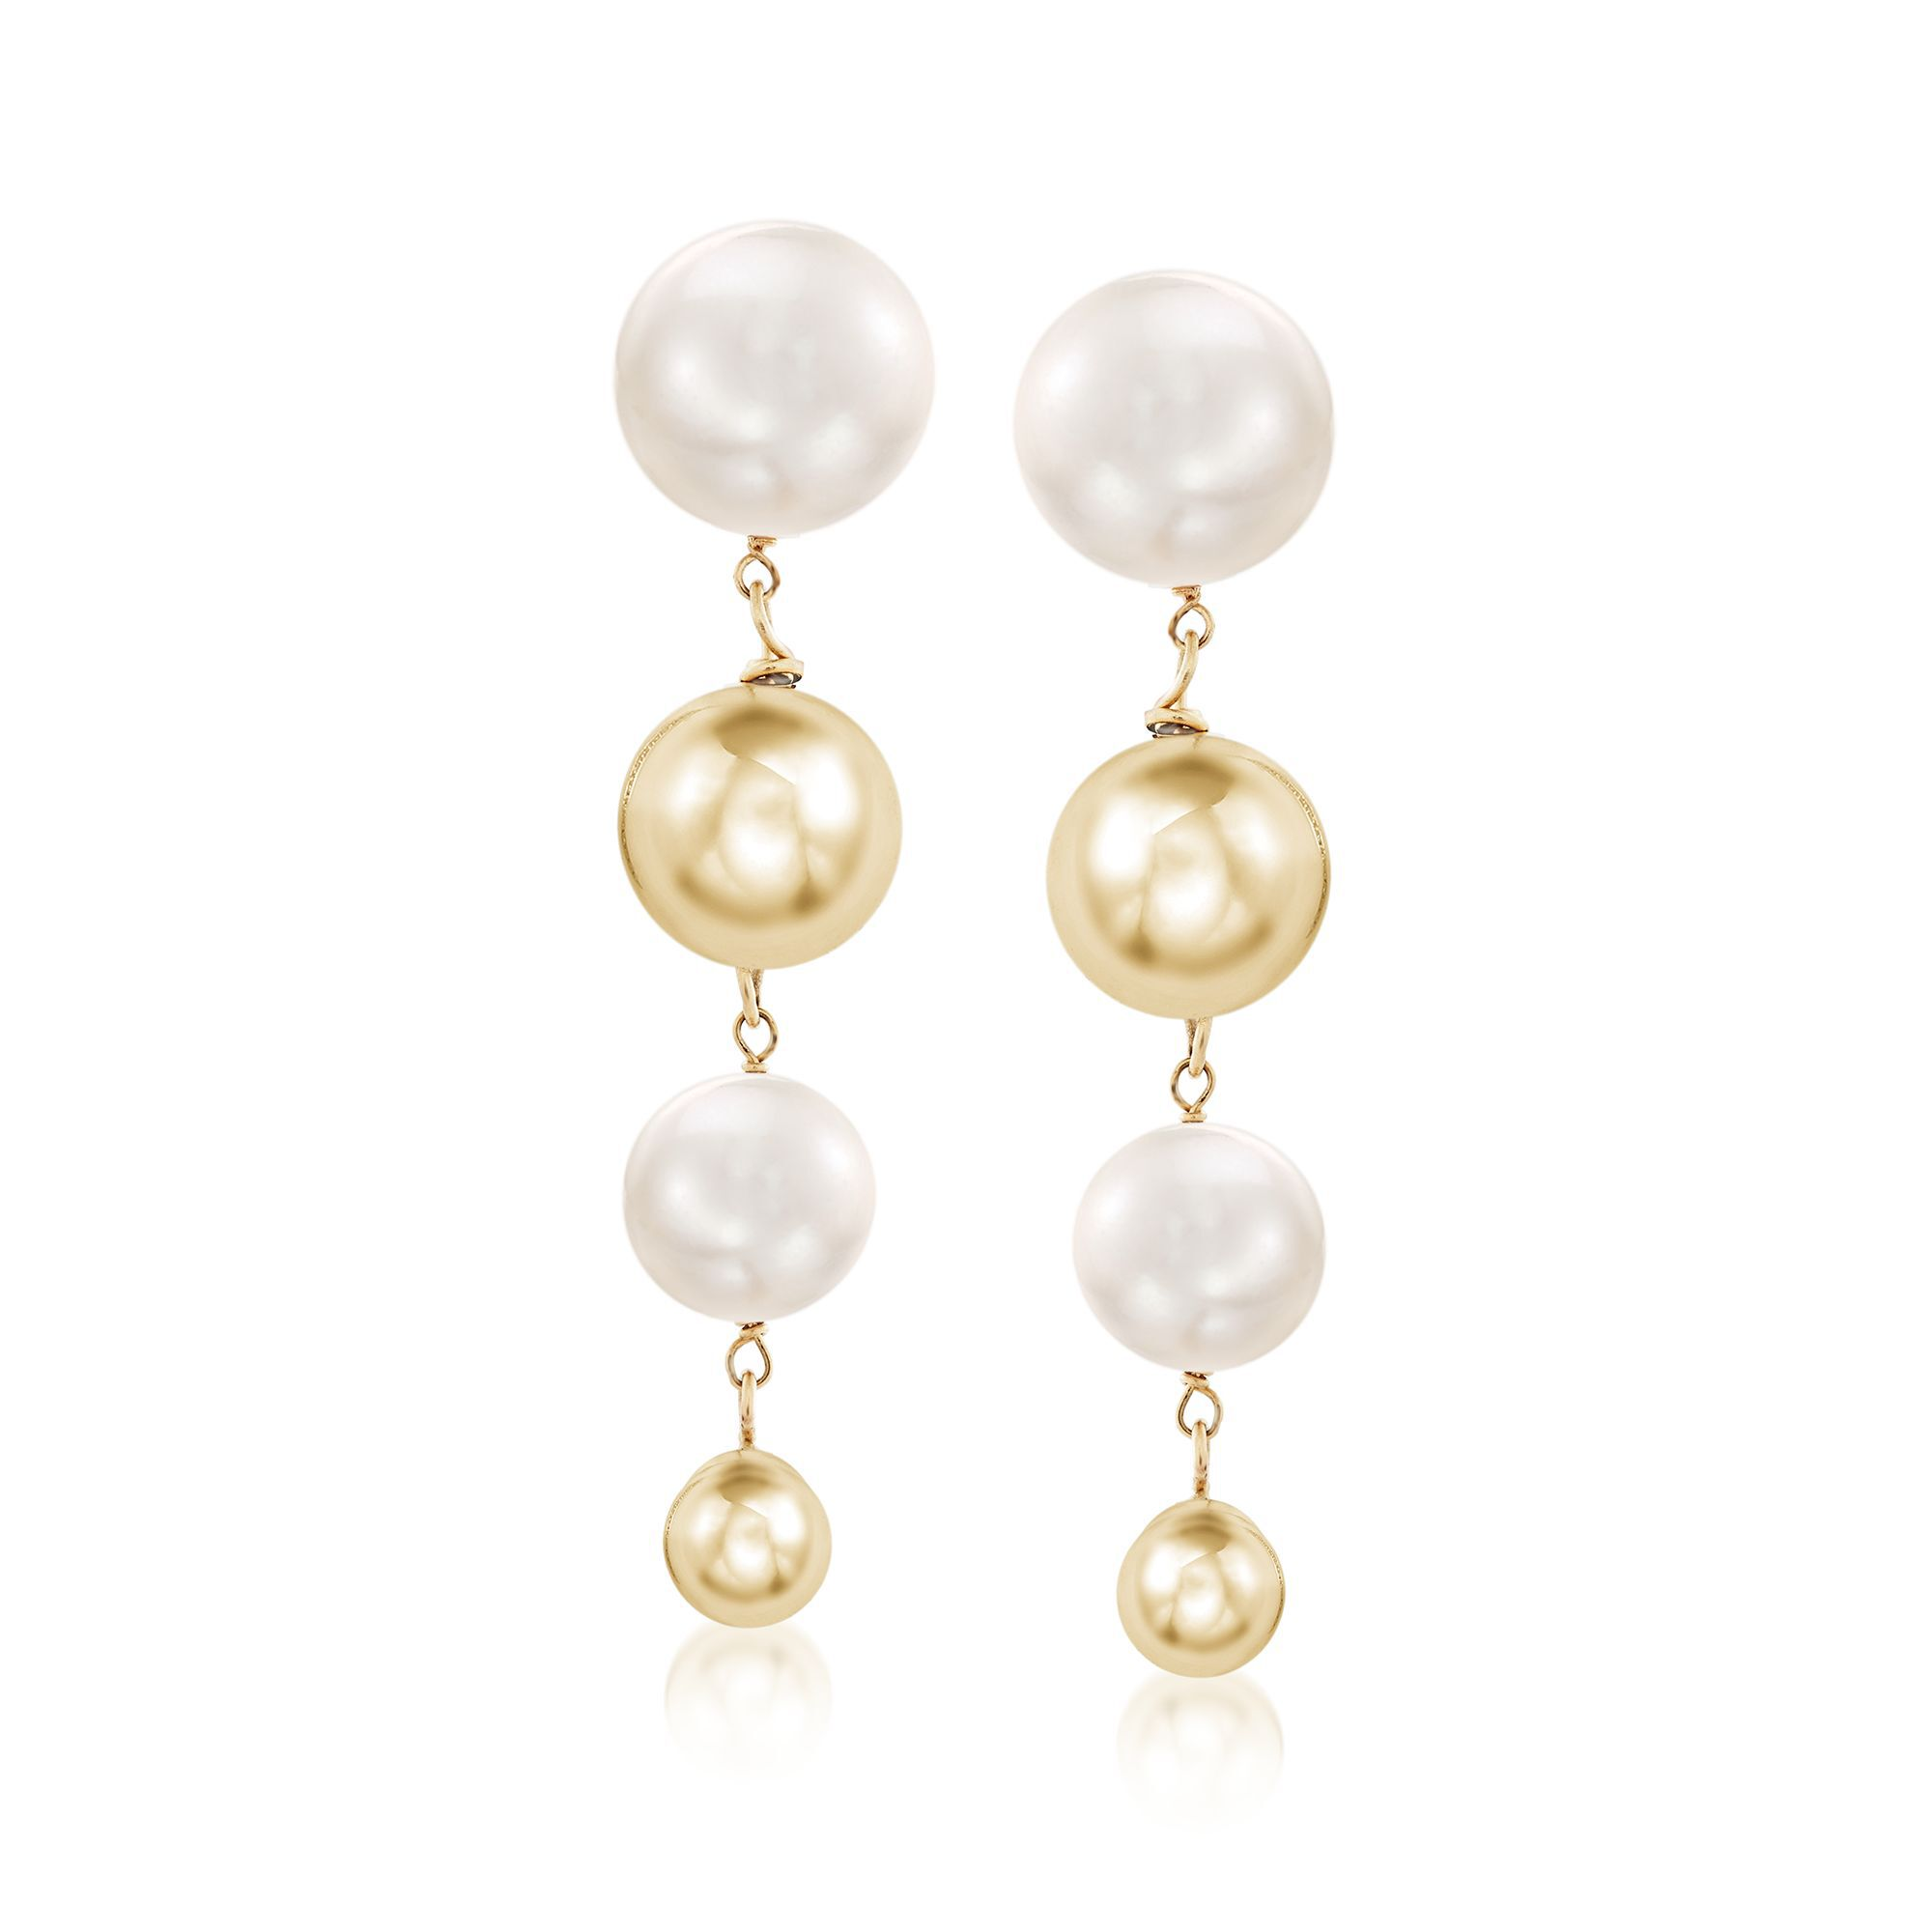 Pearl Earrings 14k Yellow Gold Dangle 6.5-10mm Graduated White Freshwater Pearl